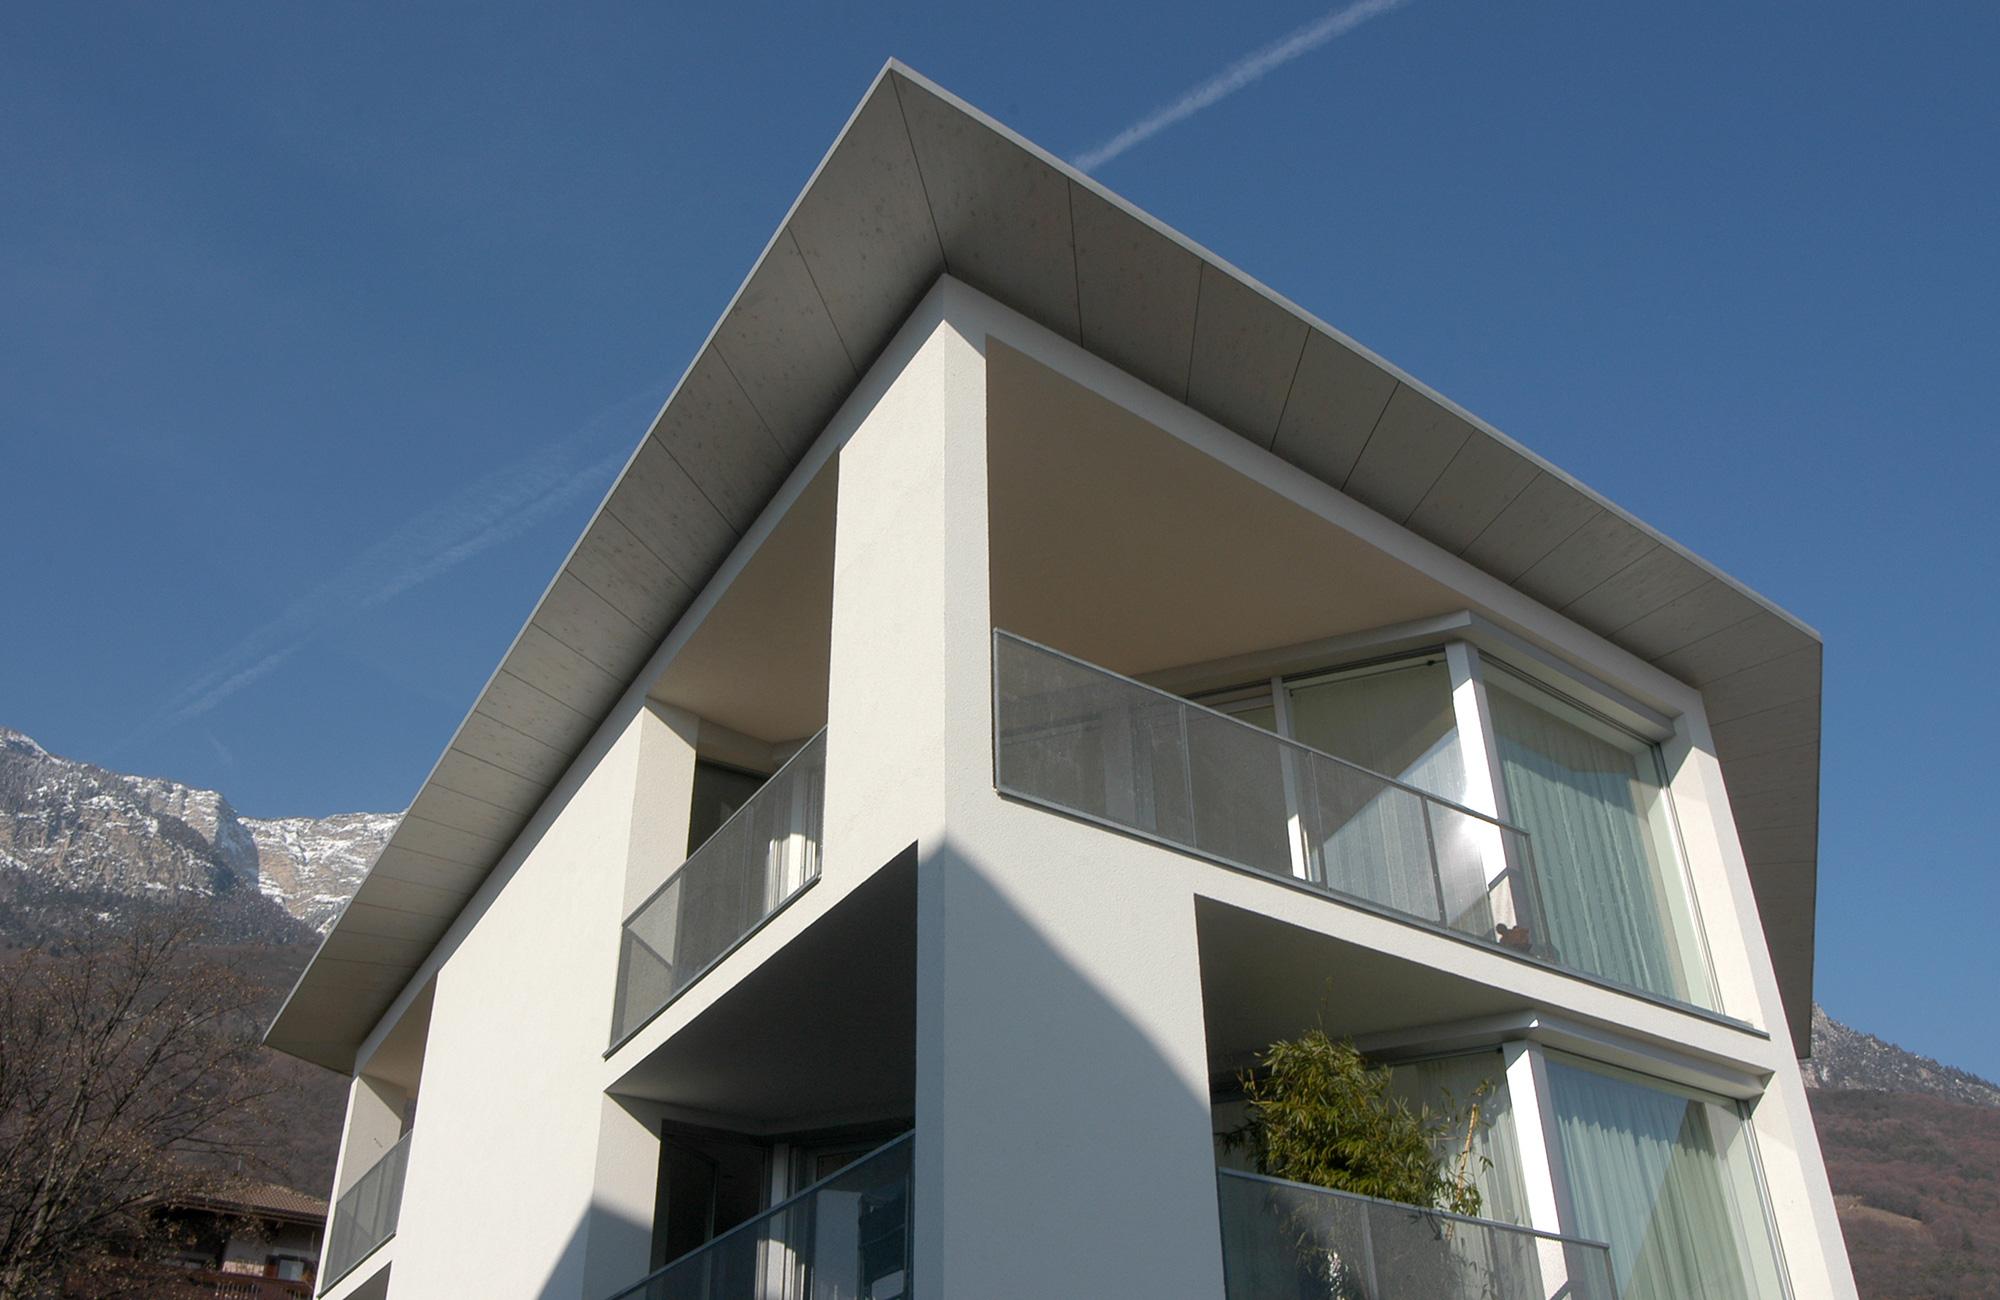 Modernes wohnhaus dibiasi for Modernes wohnhaus